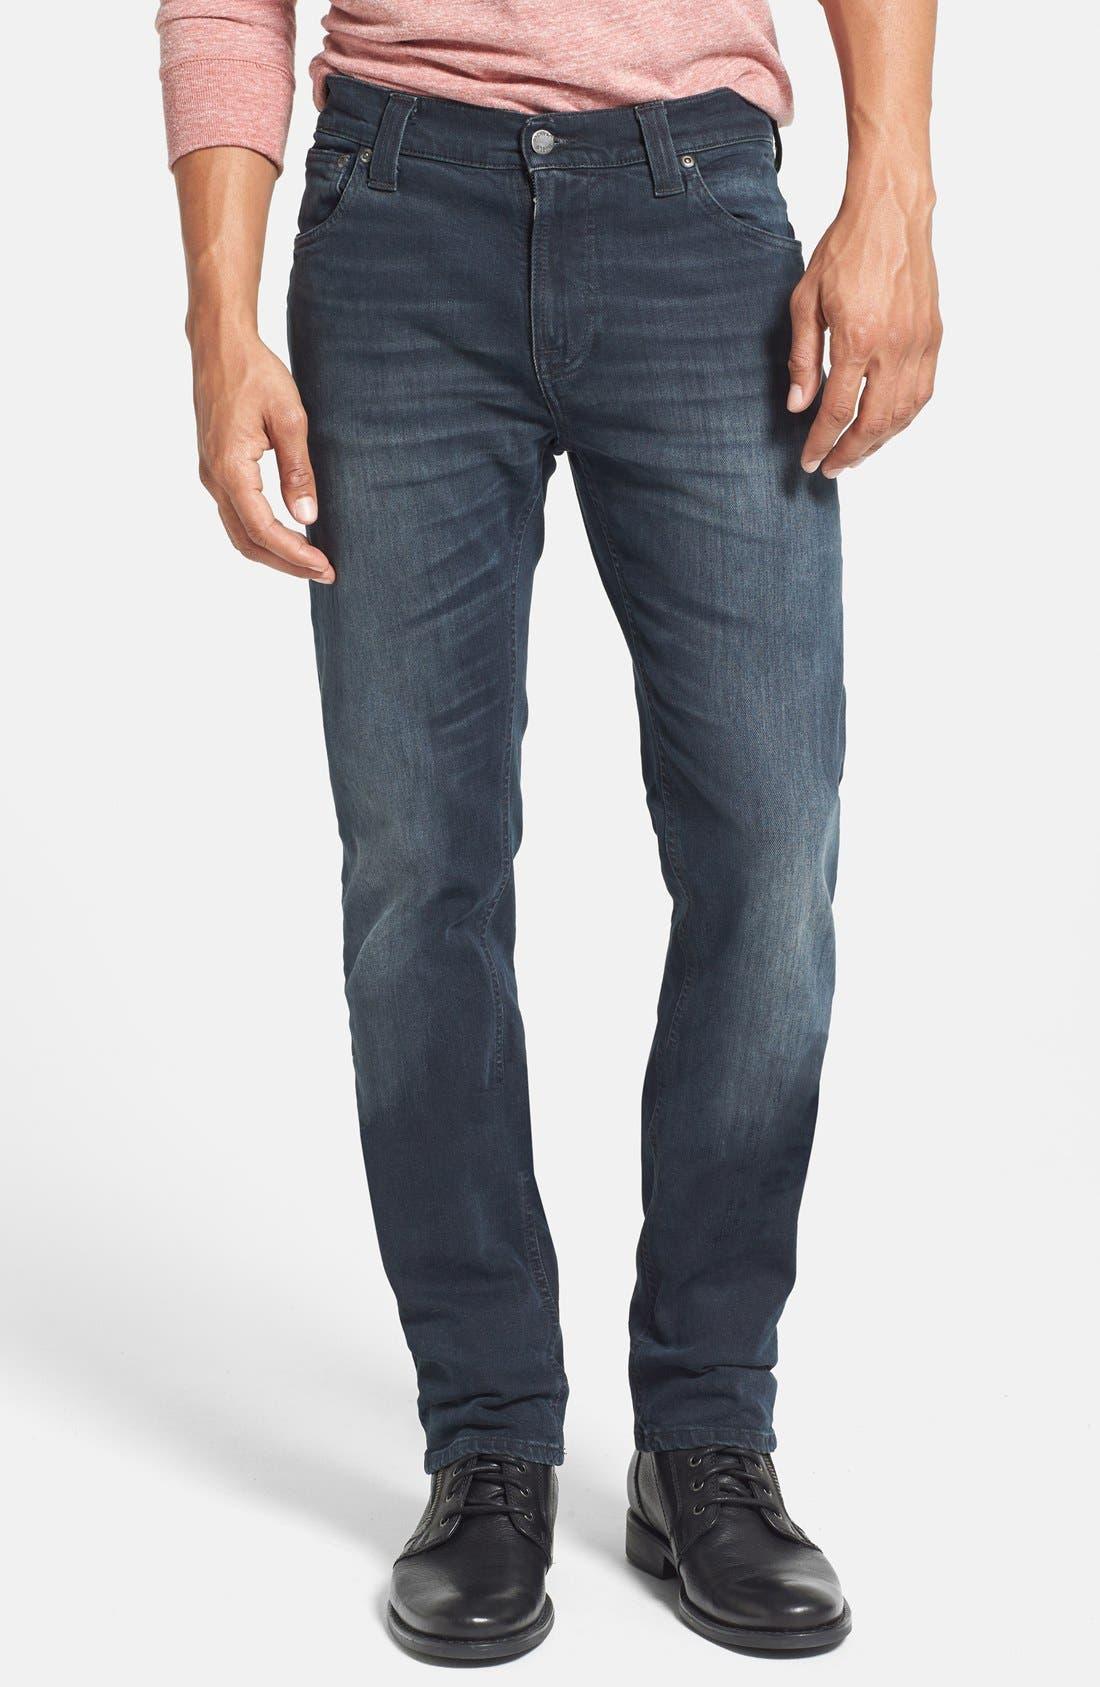 Main Image - Nudie Jeans 'Thin Finn' Skinny Fit Jeans (Organic Black Grey)